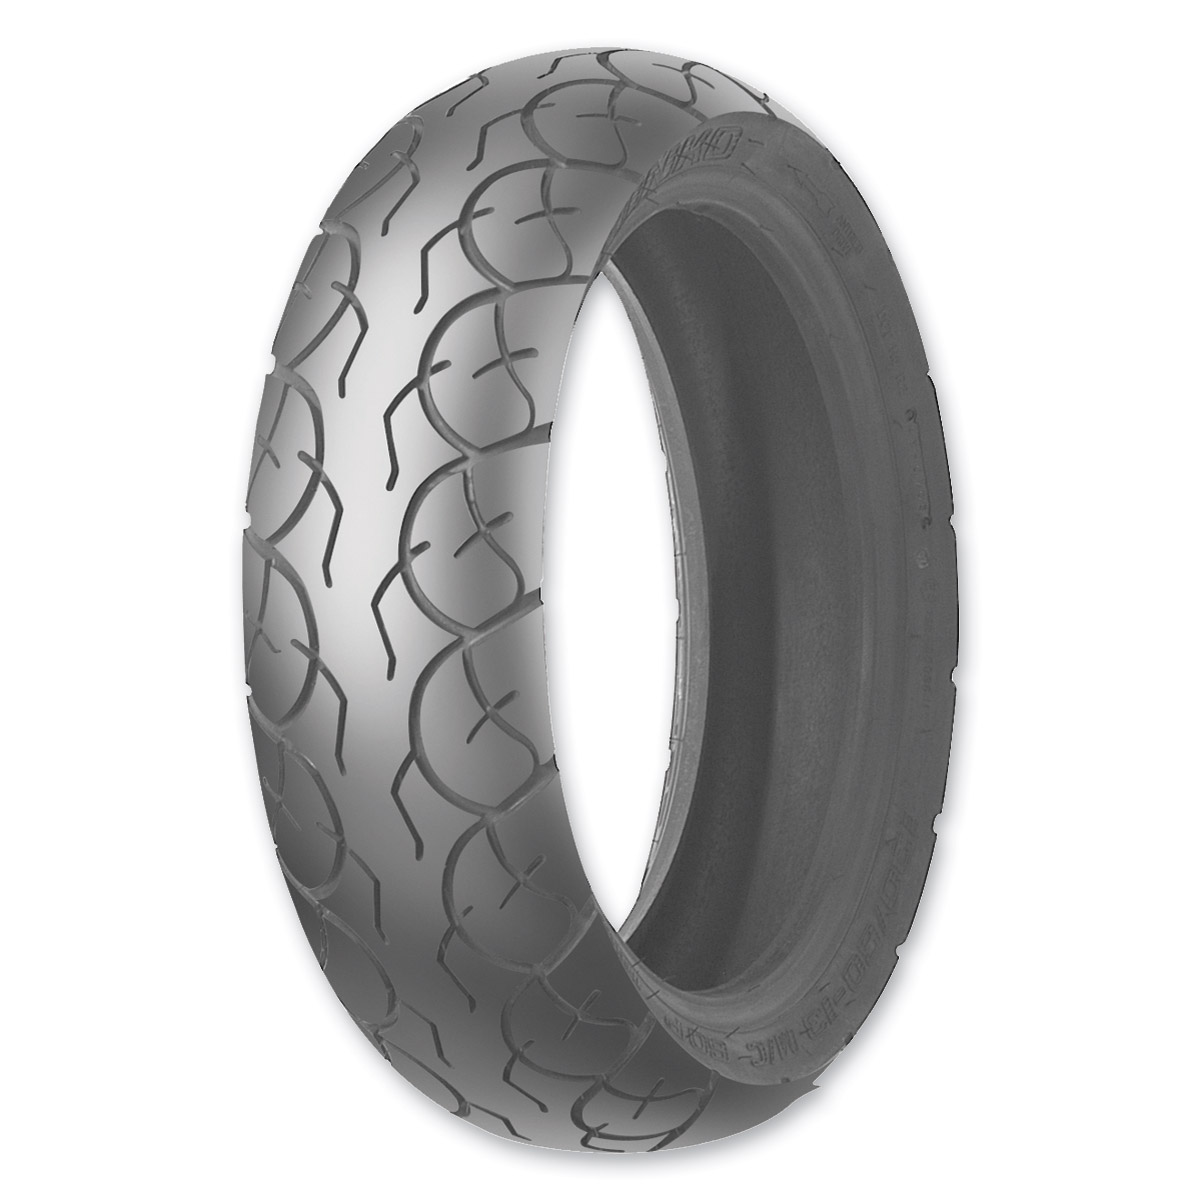 Shinko SR568 150/70-14 Rear Tire